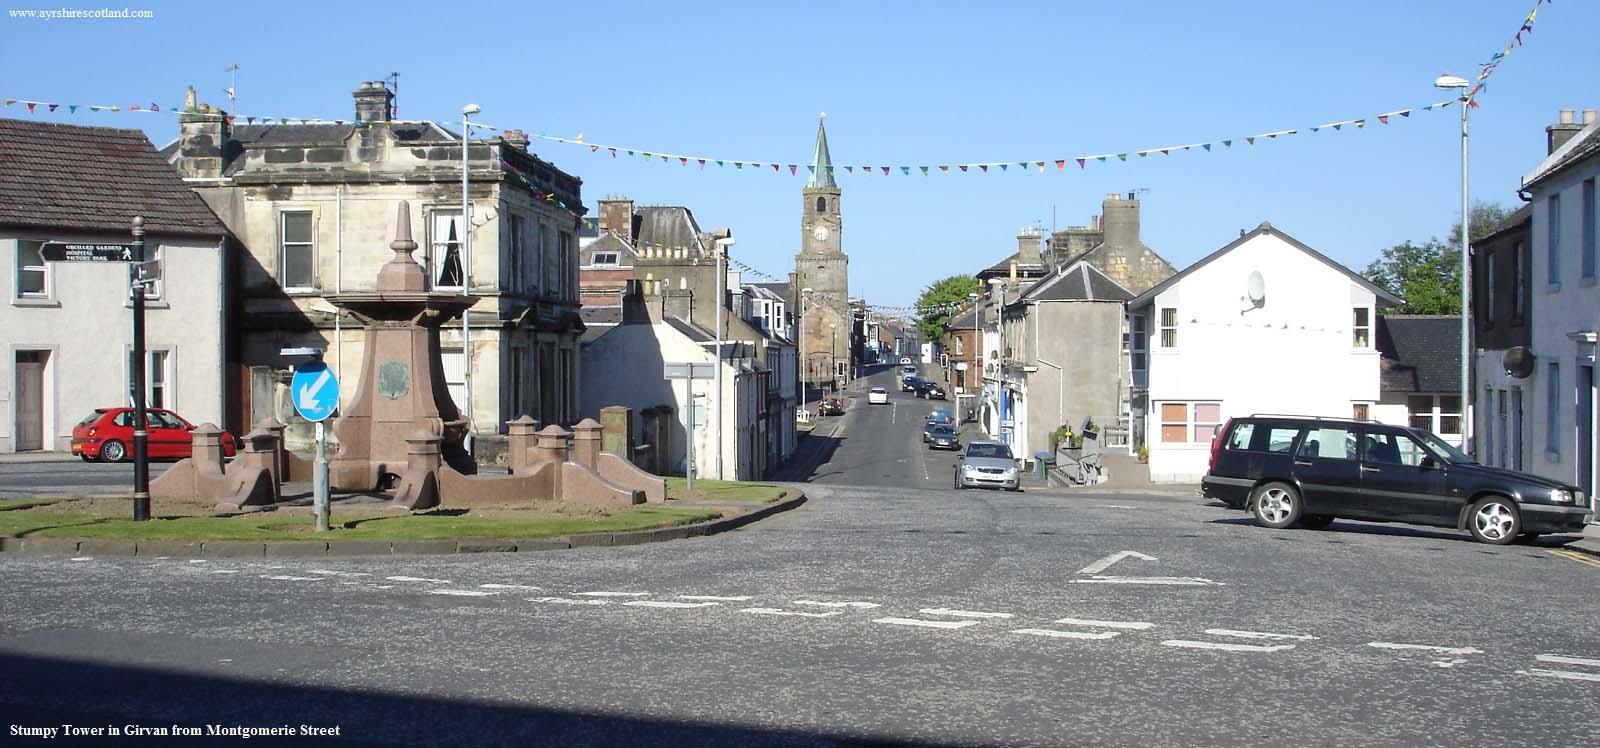 Stumpy Tower, Girvan, Ayrshire Old scotland Pinterest